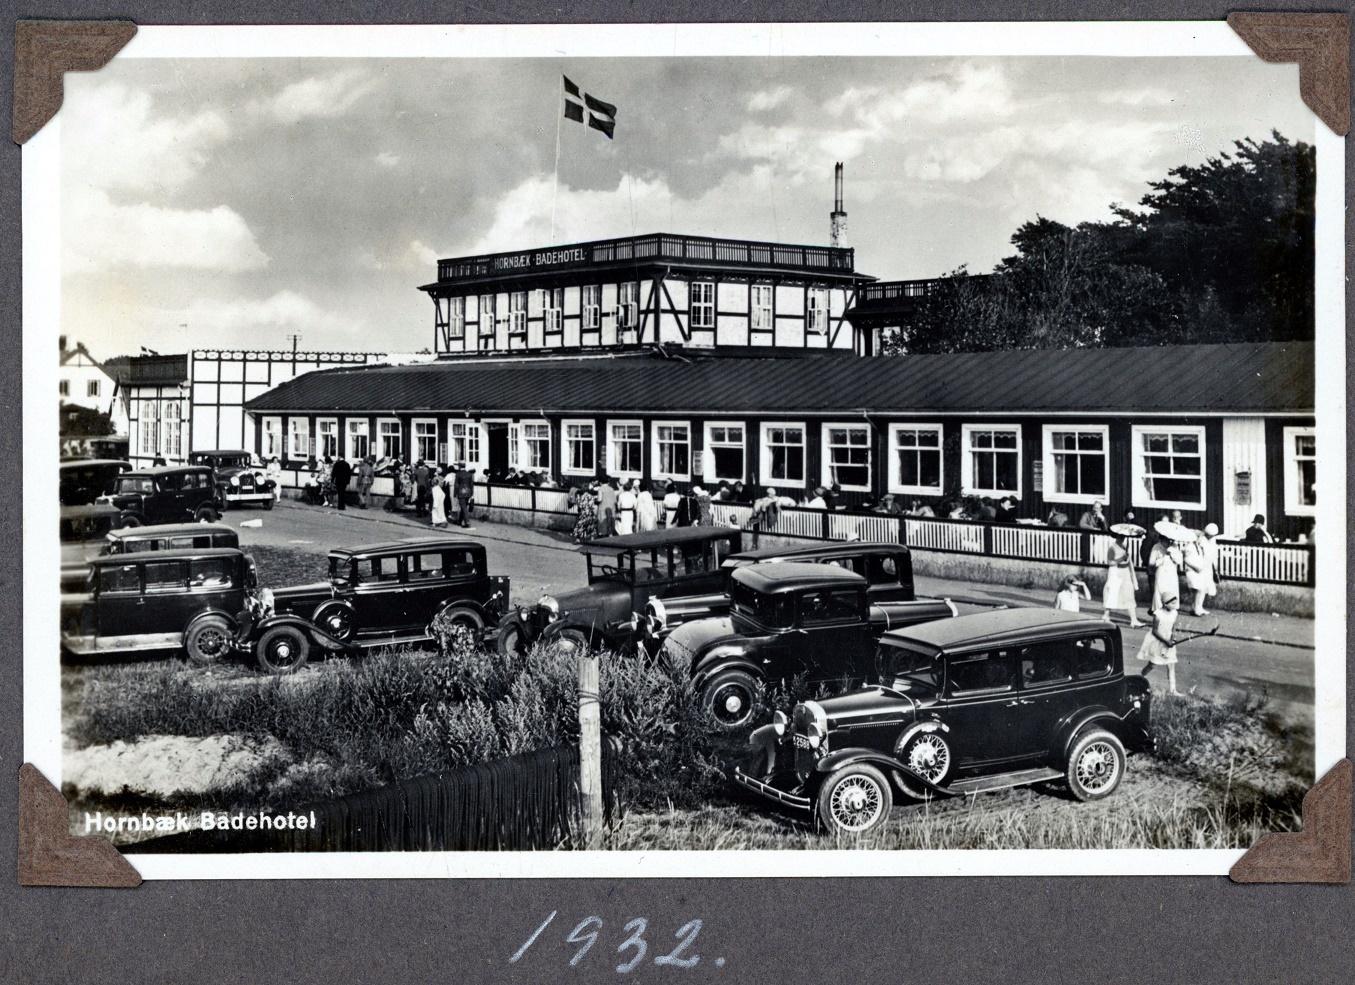 70.328 Hornbæk Badehotel 1932